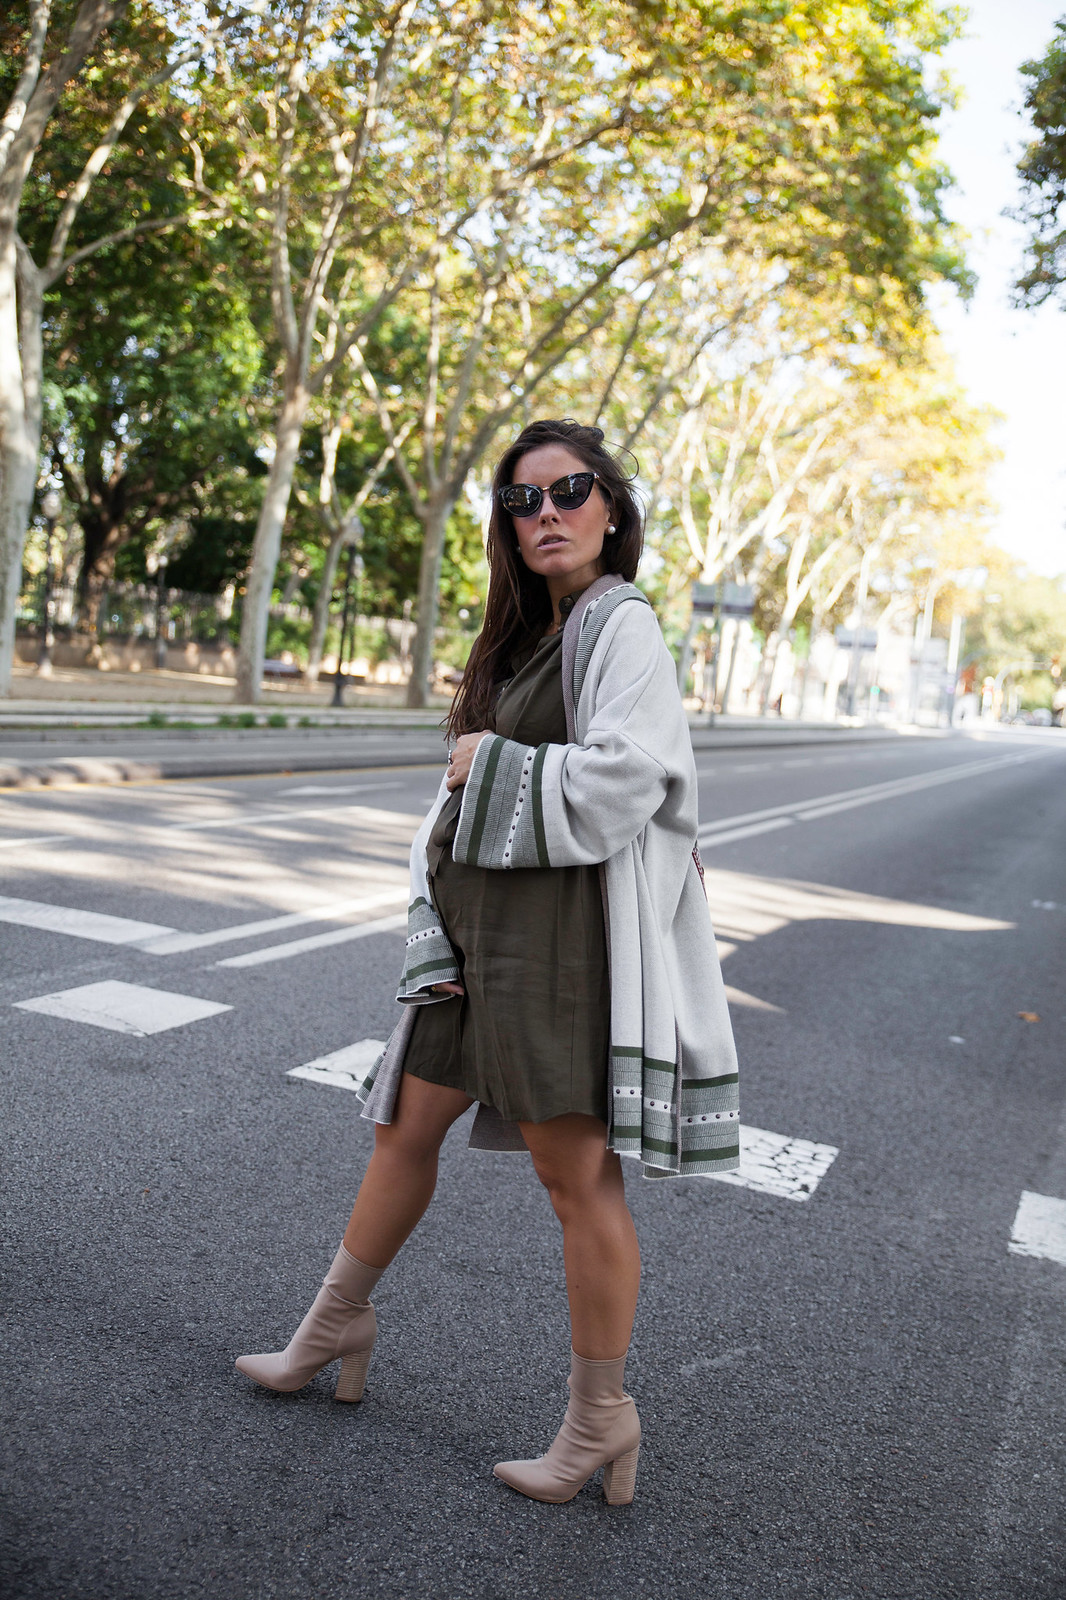 07_Como_combinar_un_cardigan_khaki_etnico_otoño_theguestgirl_rüga_laura_santolaira_influencer_embarazada_fashion_street_style_barcelona